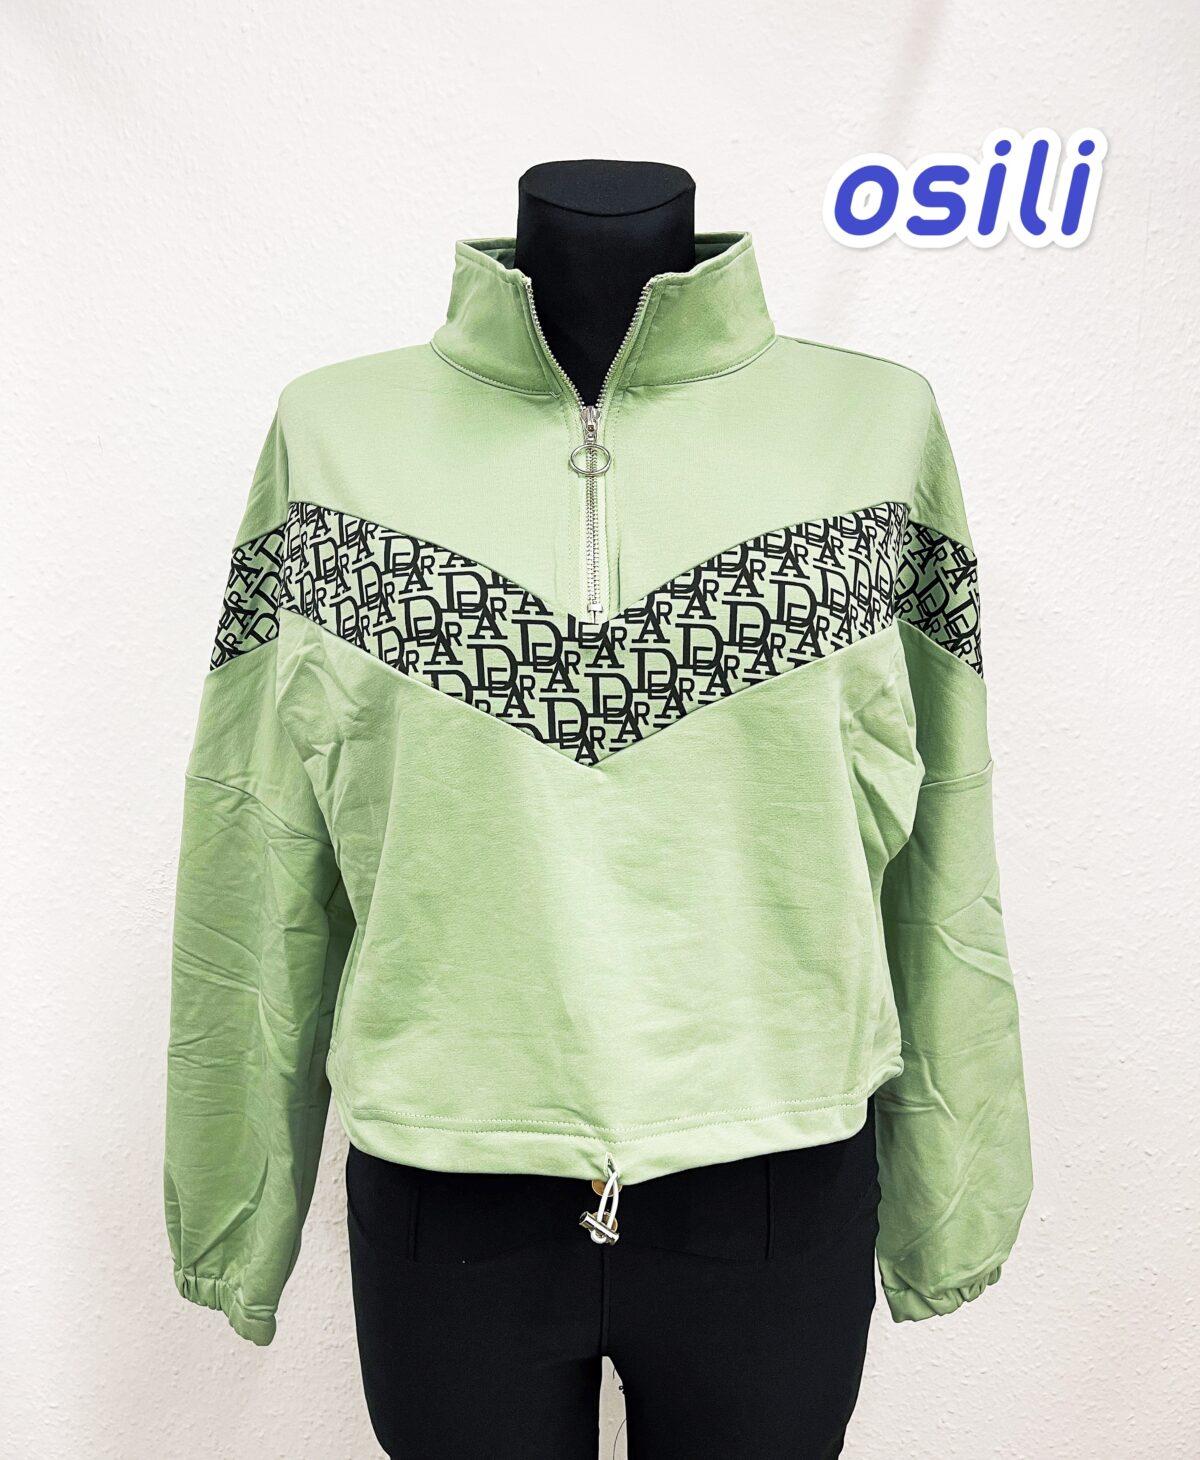 CB74472D 470A 4248 BB2E ACADED7D685C scaled Osili - Fashion - Divat